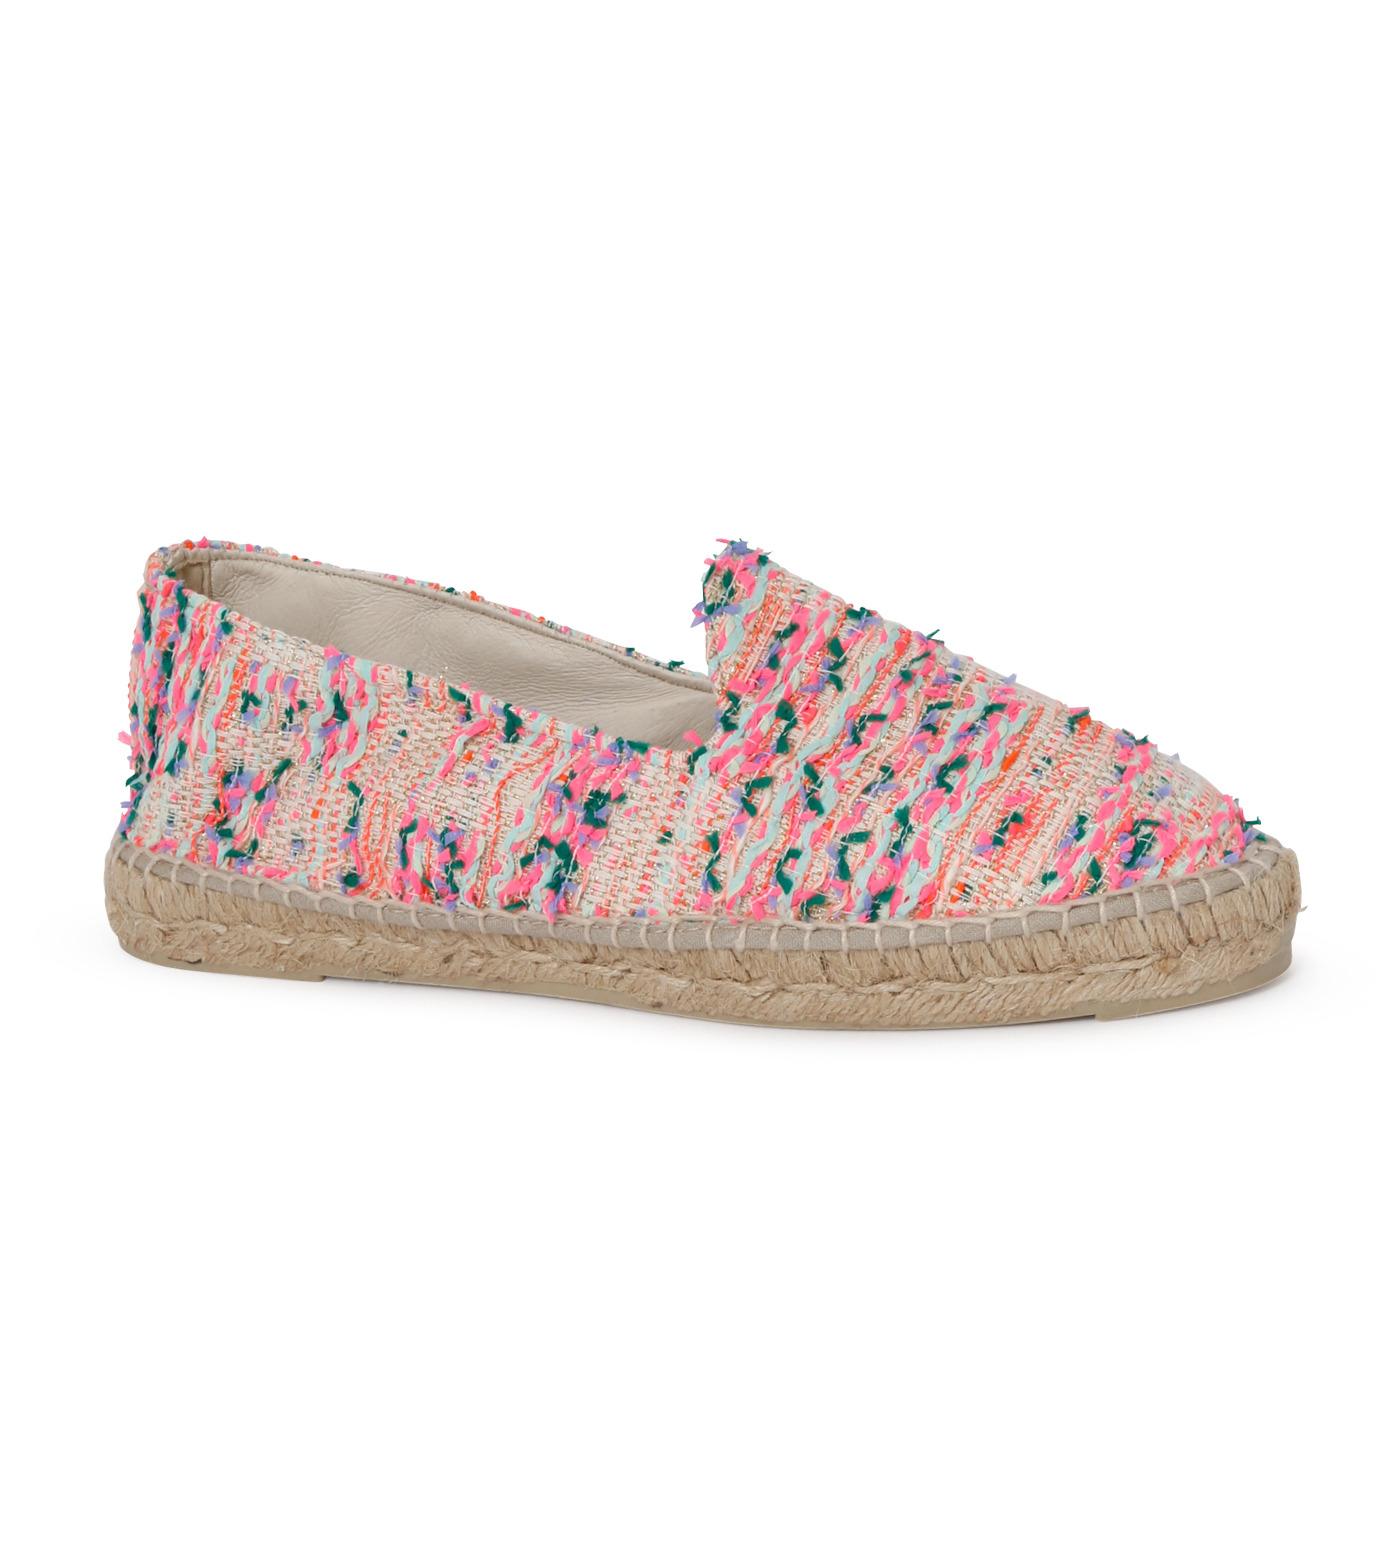 Manebi(マネビ)のneon tweed slippers-NEON PINK(シューズ/shoes)-V-4-3-N-70 拡大詳細画像1